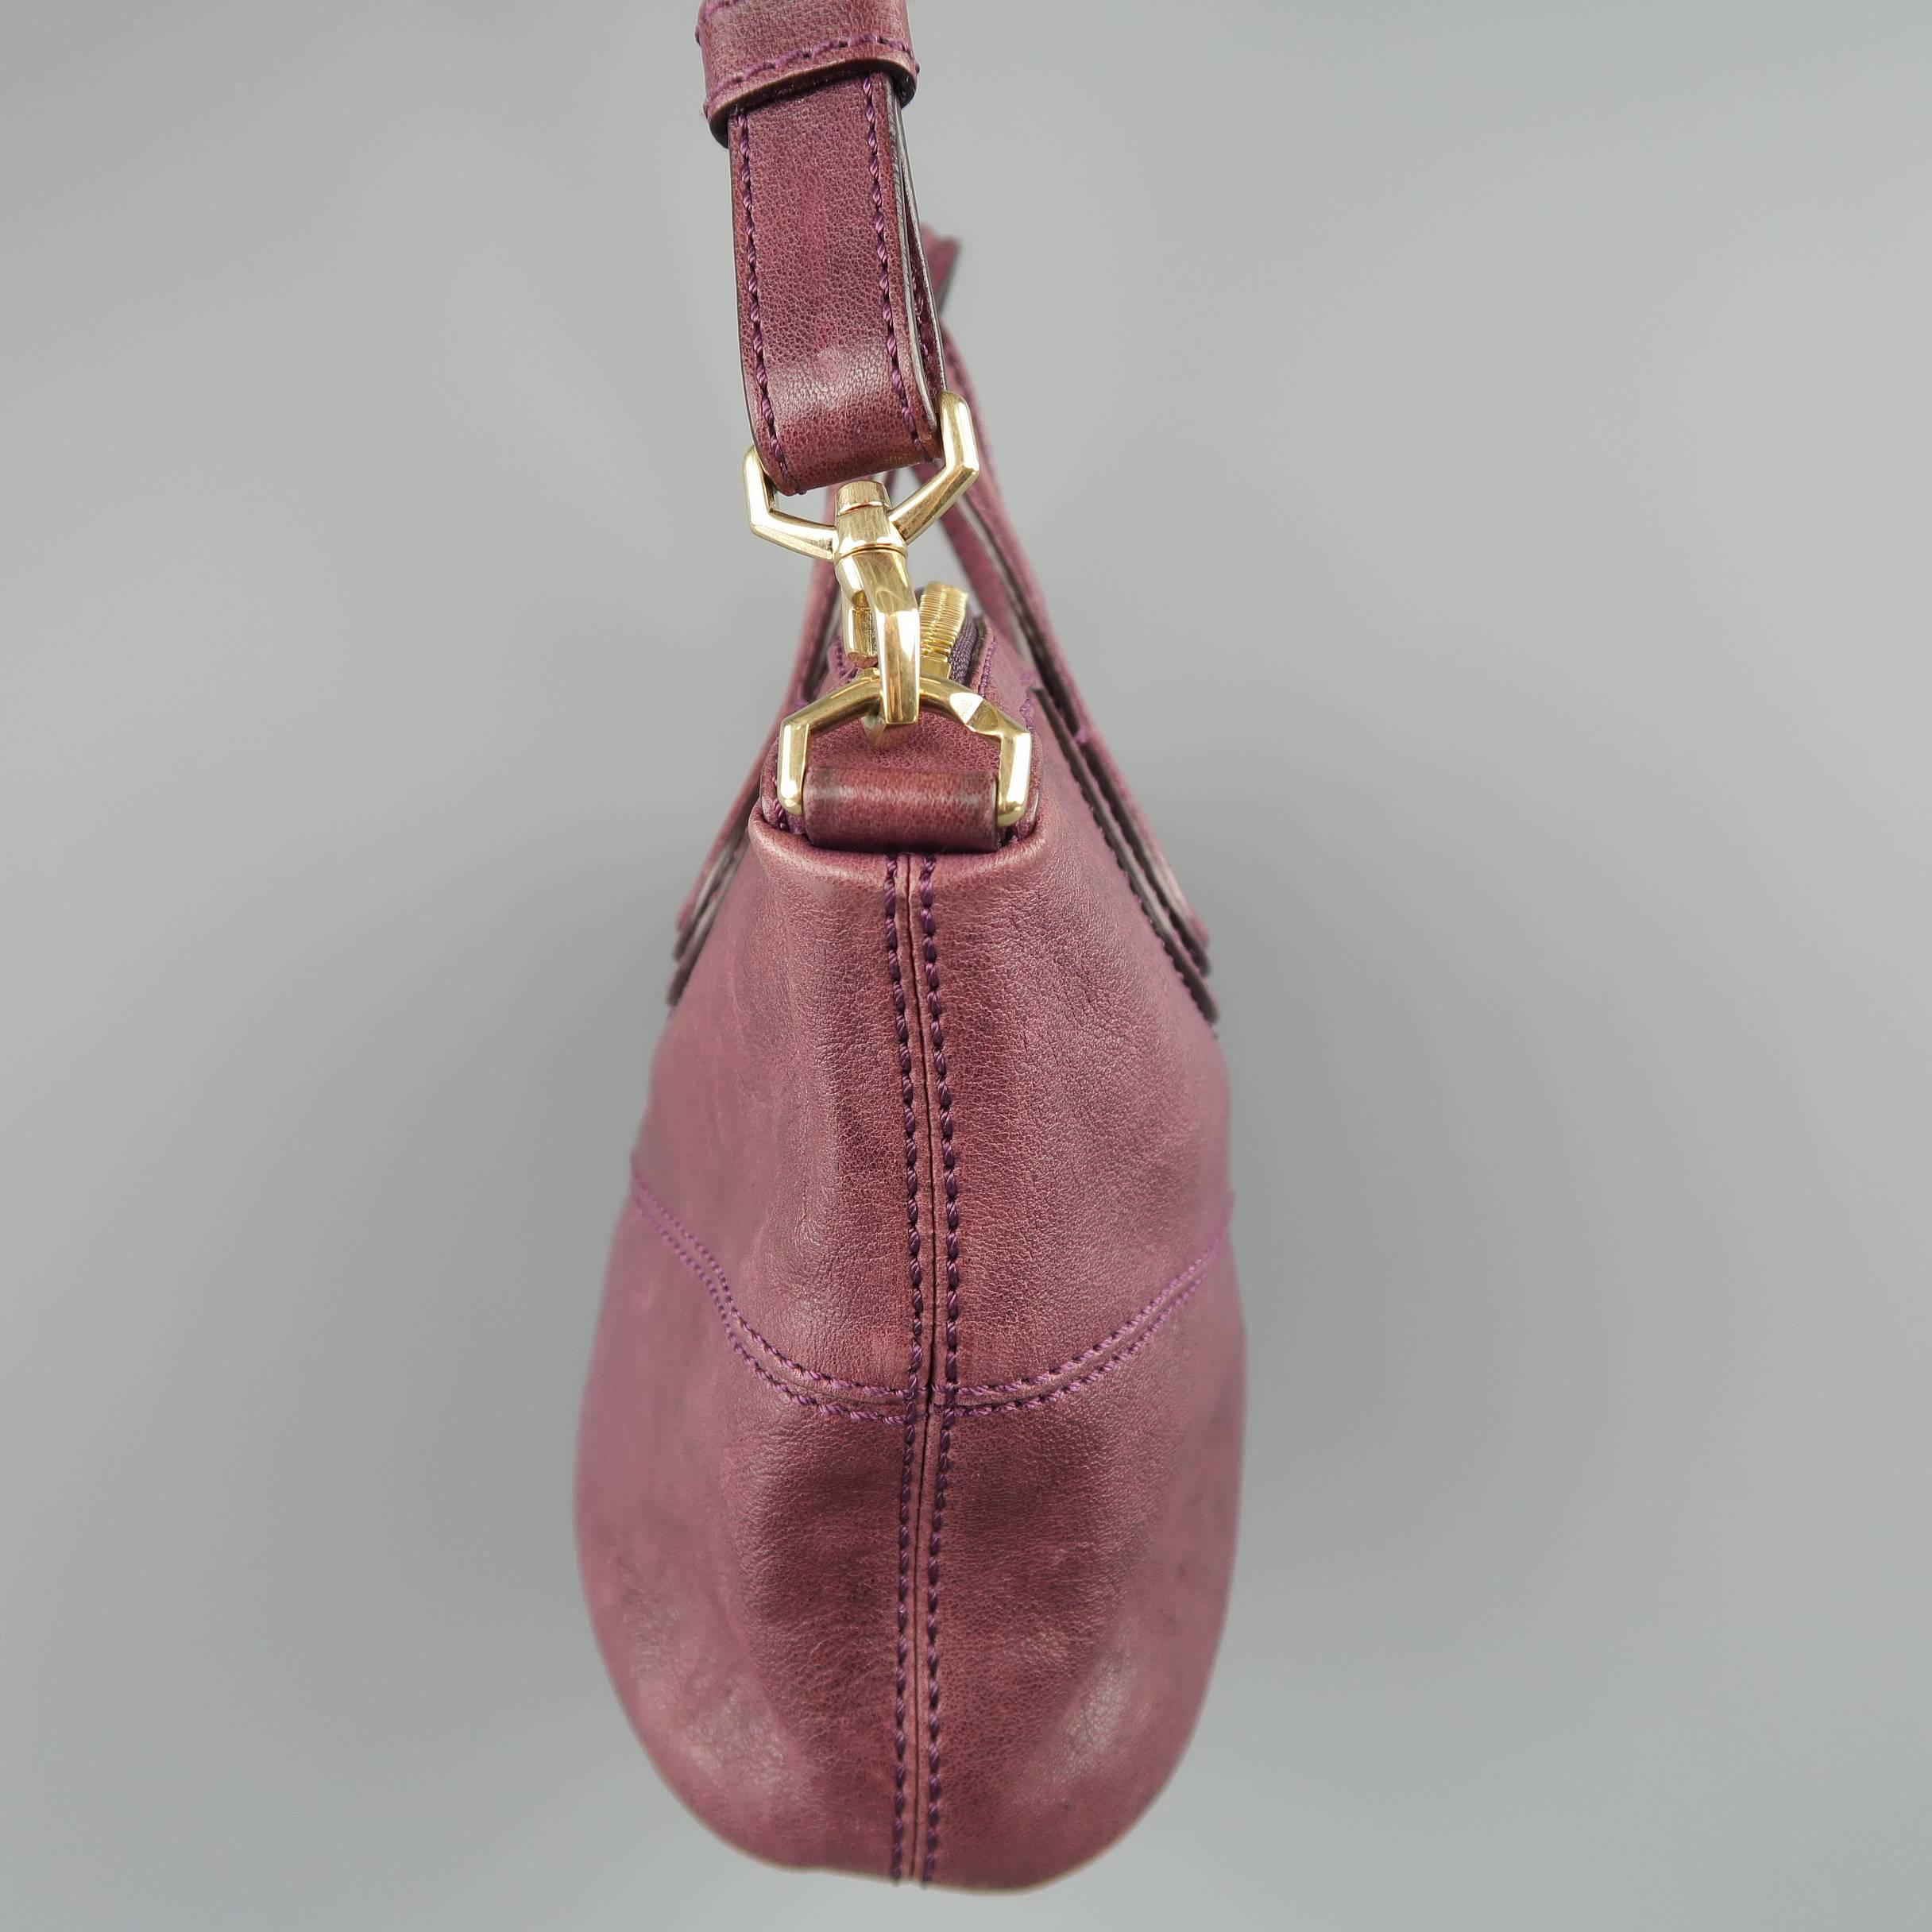 Givenchy Plum Purple Leather Nightingale Mini Handbag at 1stdibs 8dfb4bc2e6bbd